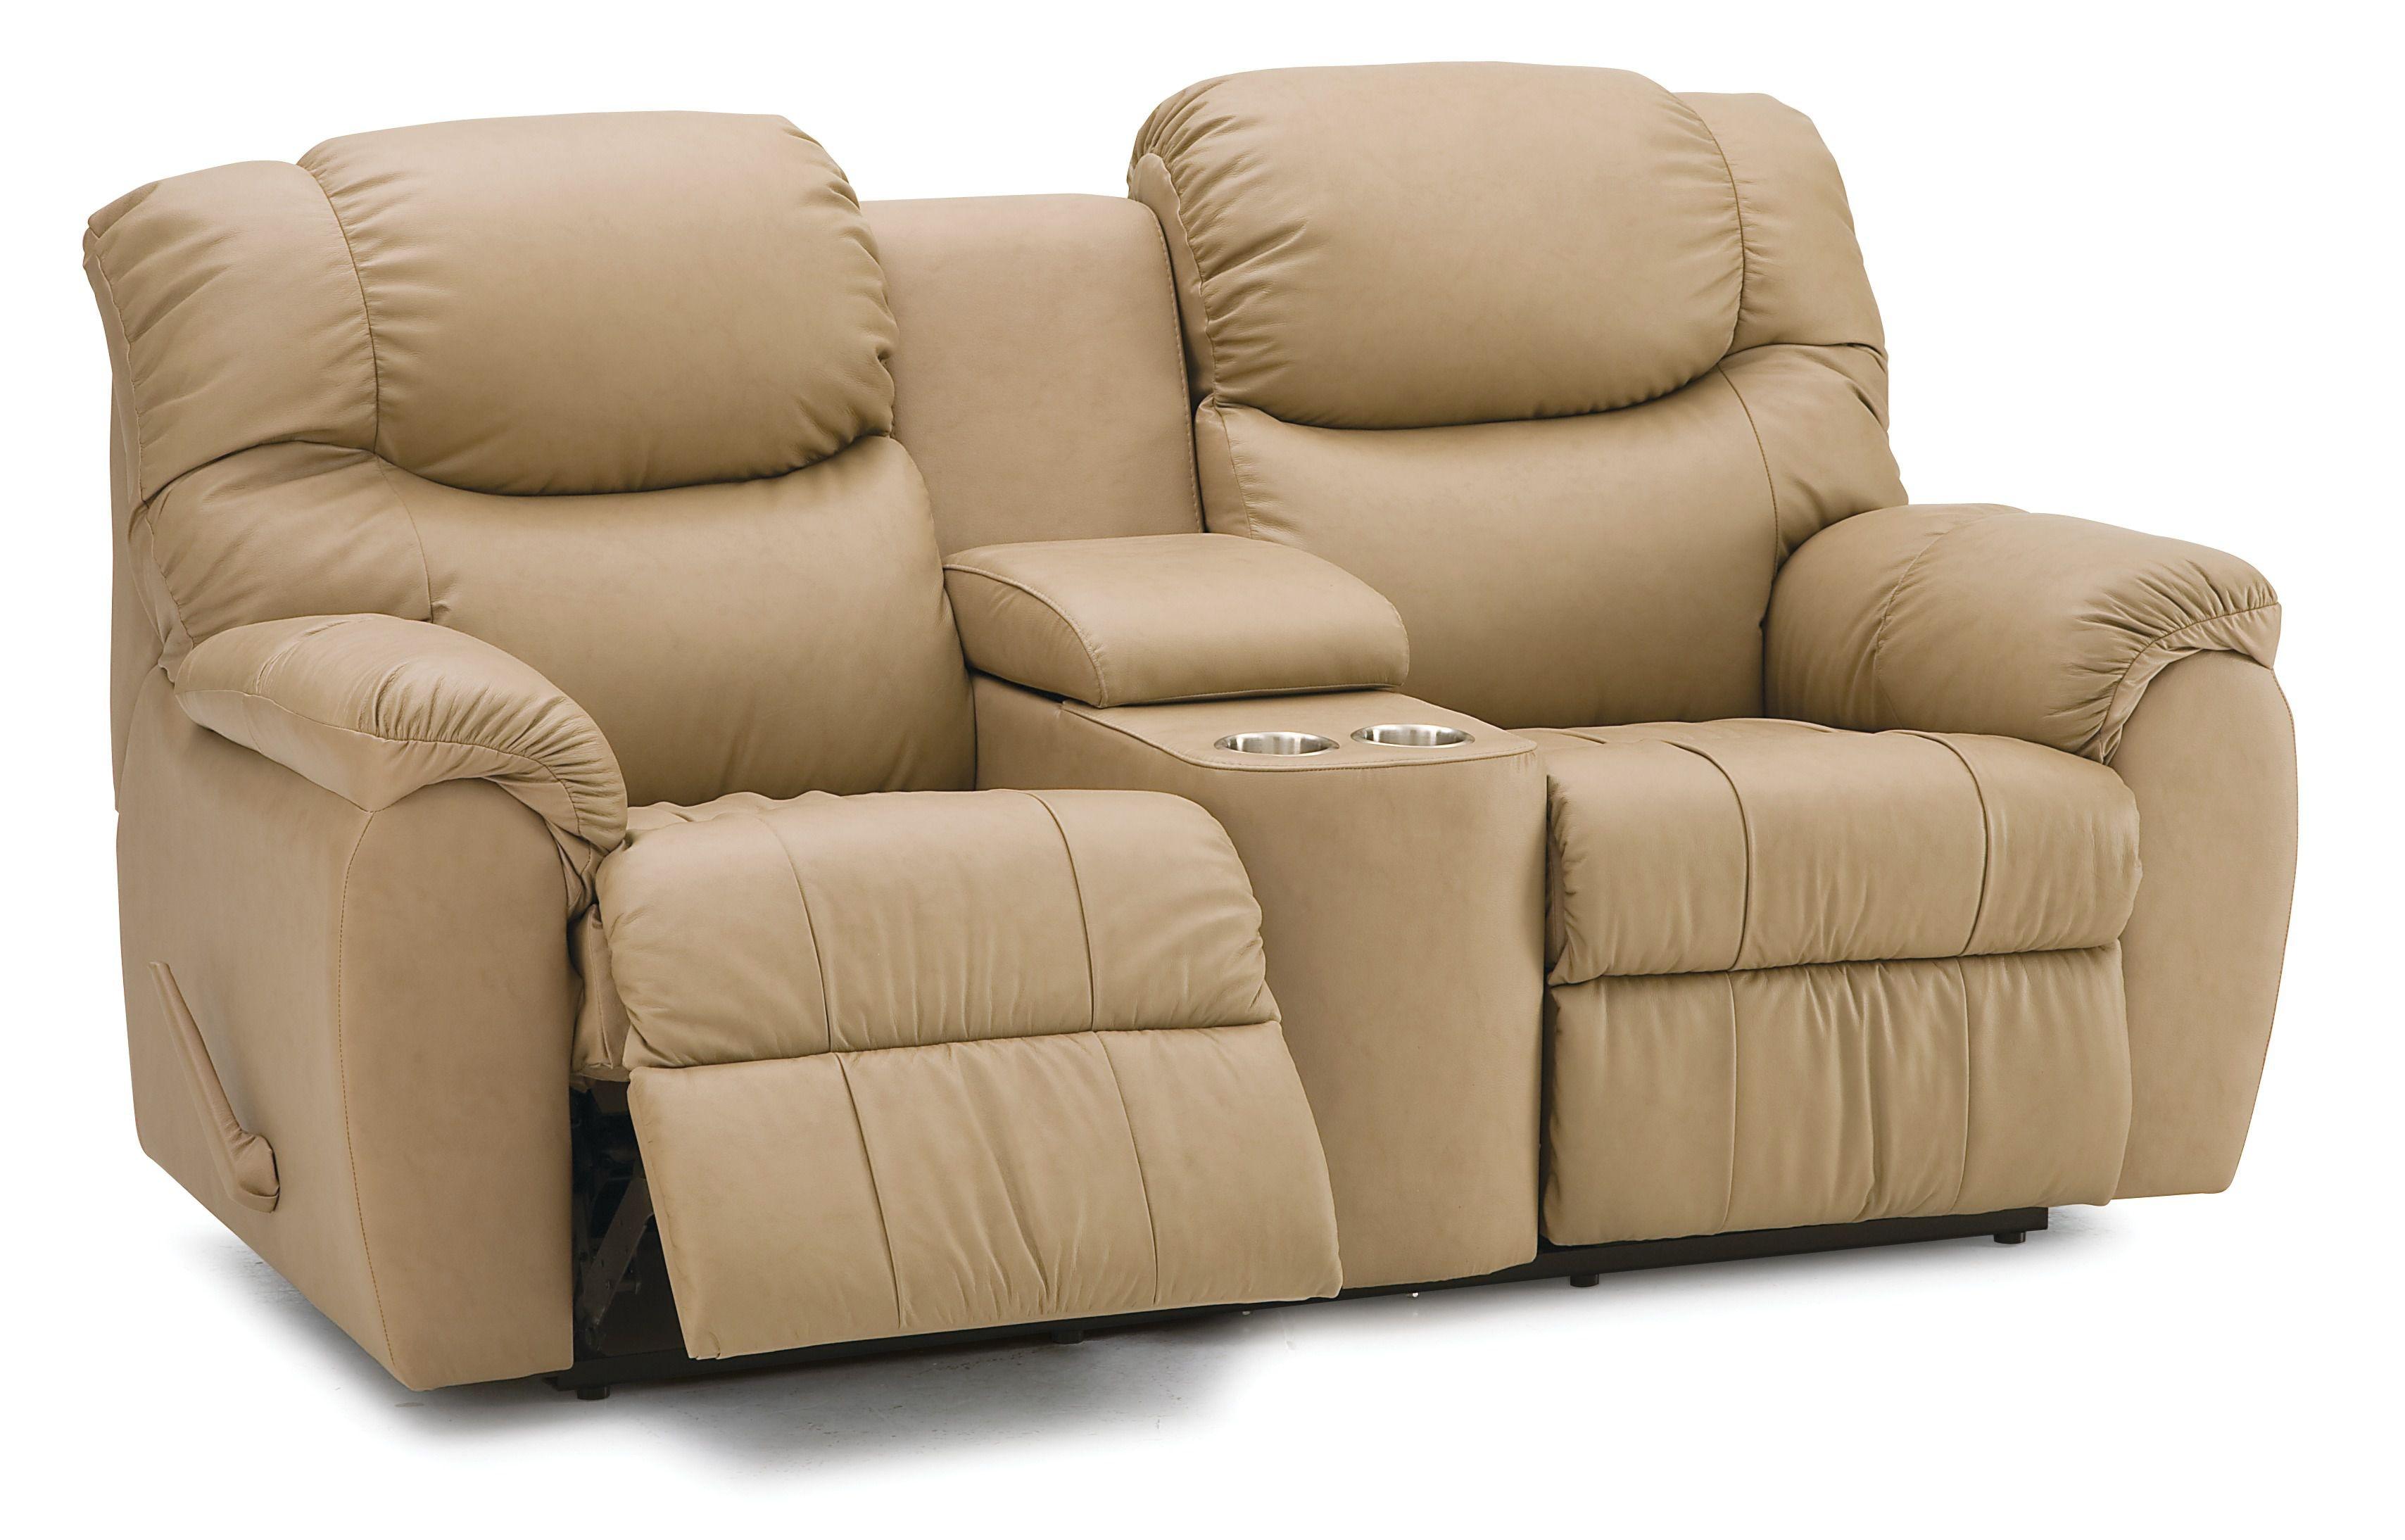 Palliser Furniture Loveseat Console 41094 58